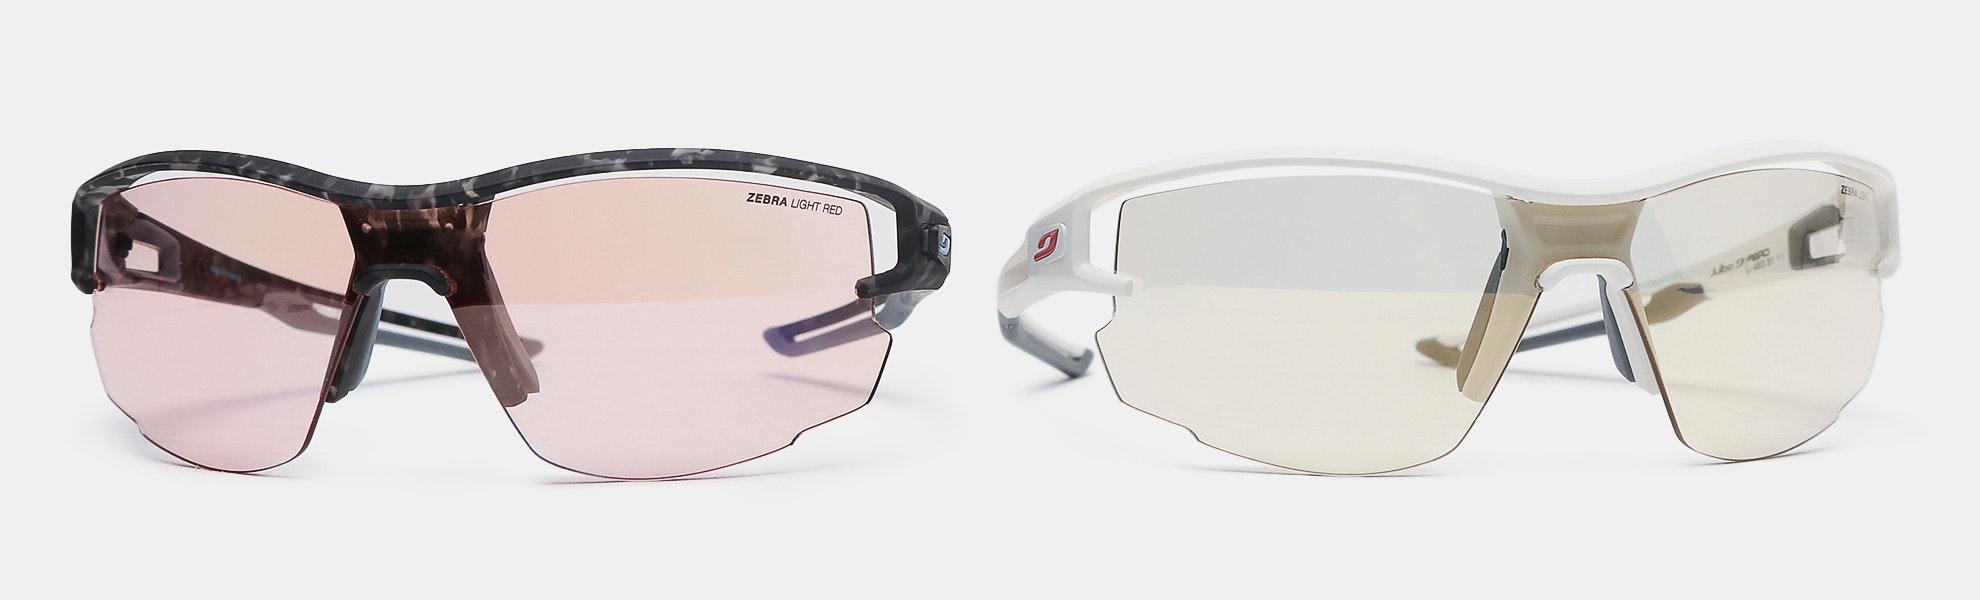 Julbo Aero & Aerolite Sunglasses